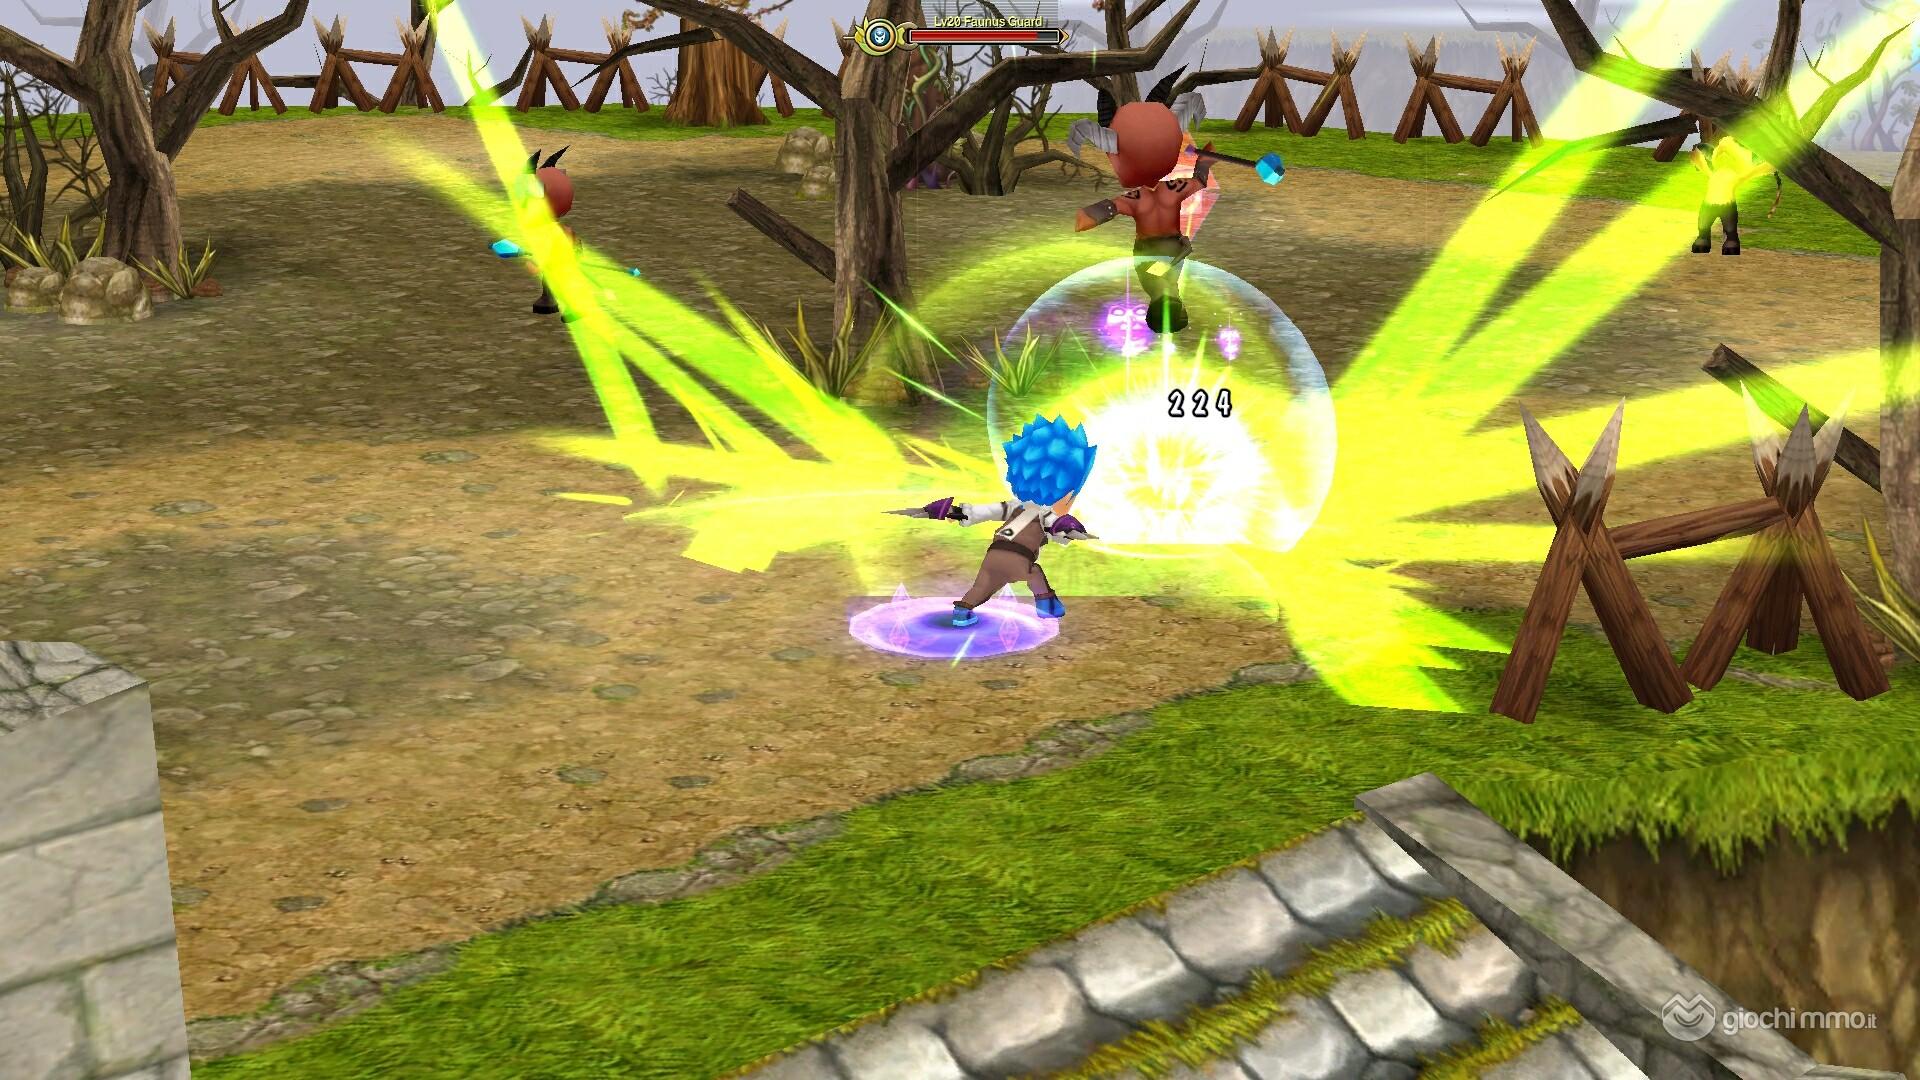 Clicca sull'immagine per ingrandirlaNome: Legend of edda screen05.jpgVisite: 59Dimensione: 580.7 KBID: 8529